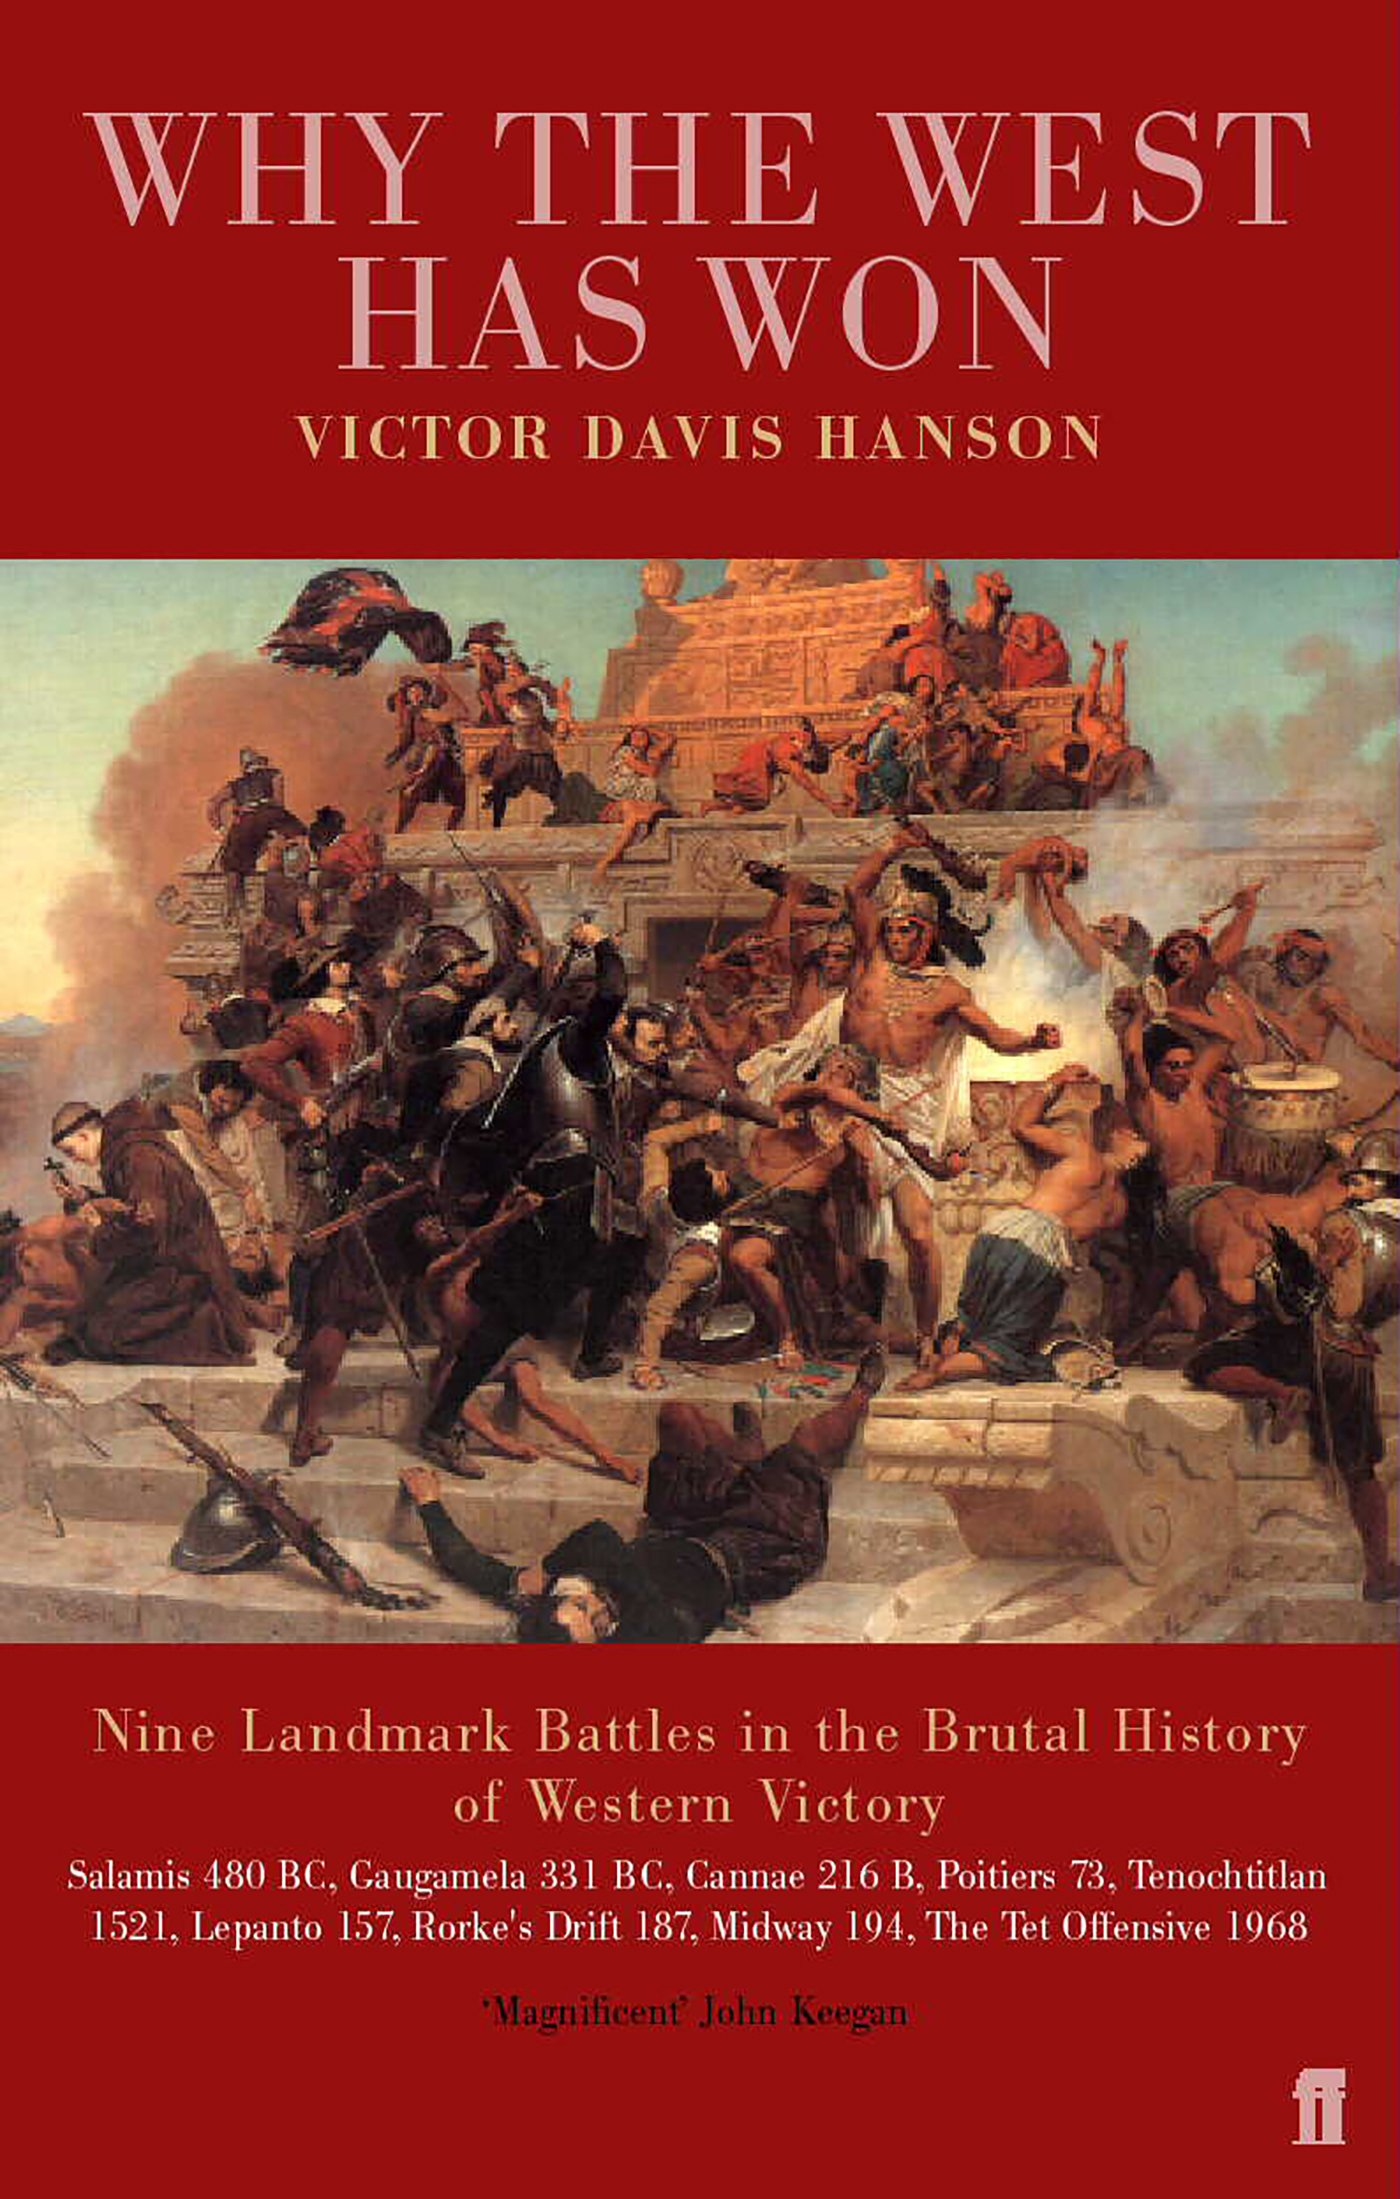 Why the West has Won: Victor Davis Hanson: 9780571216406: Amazon.com ...